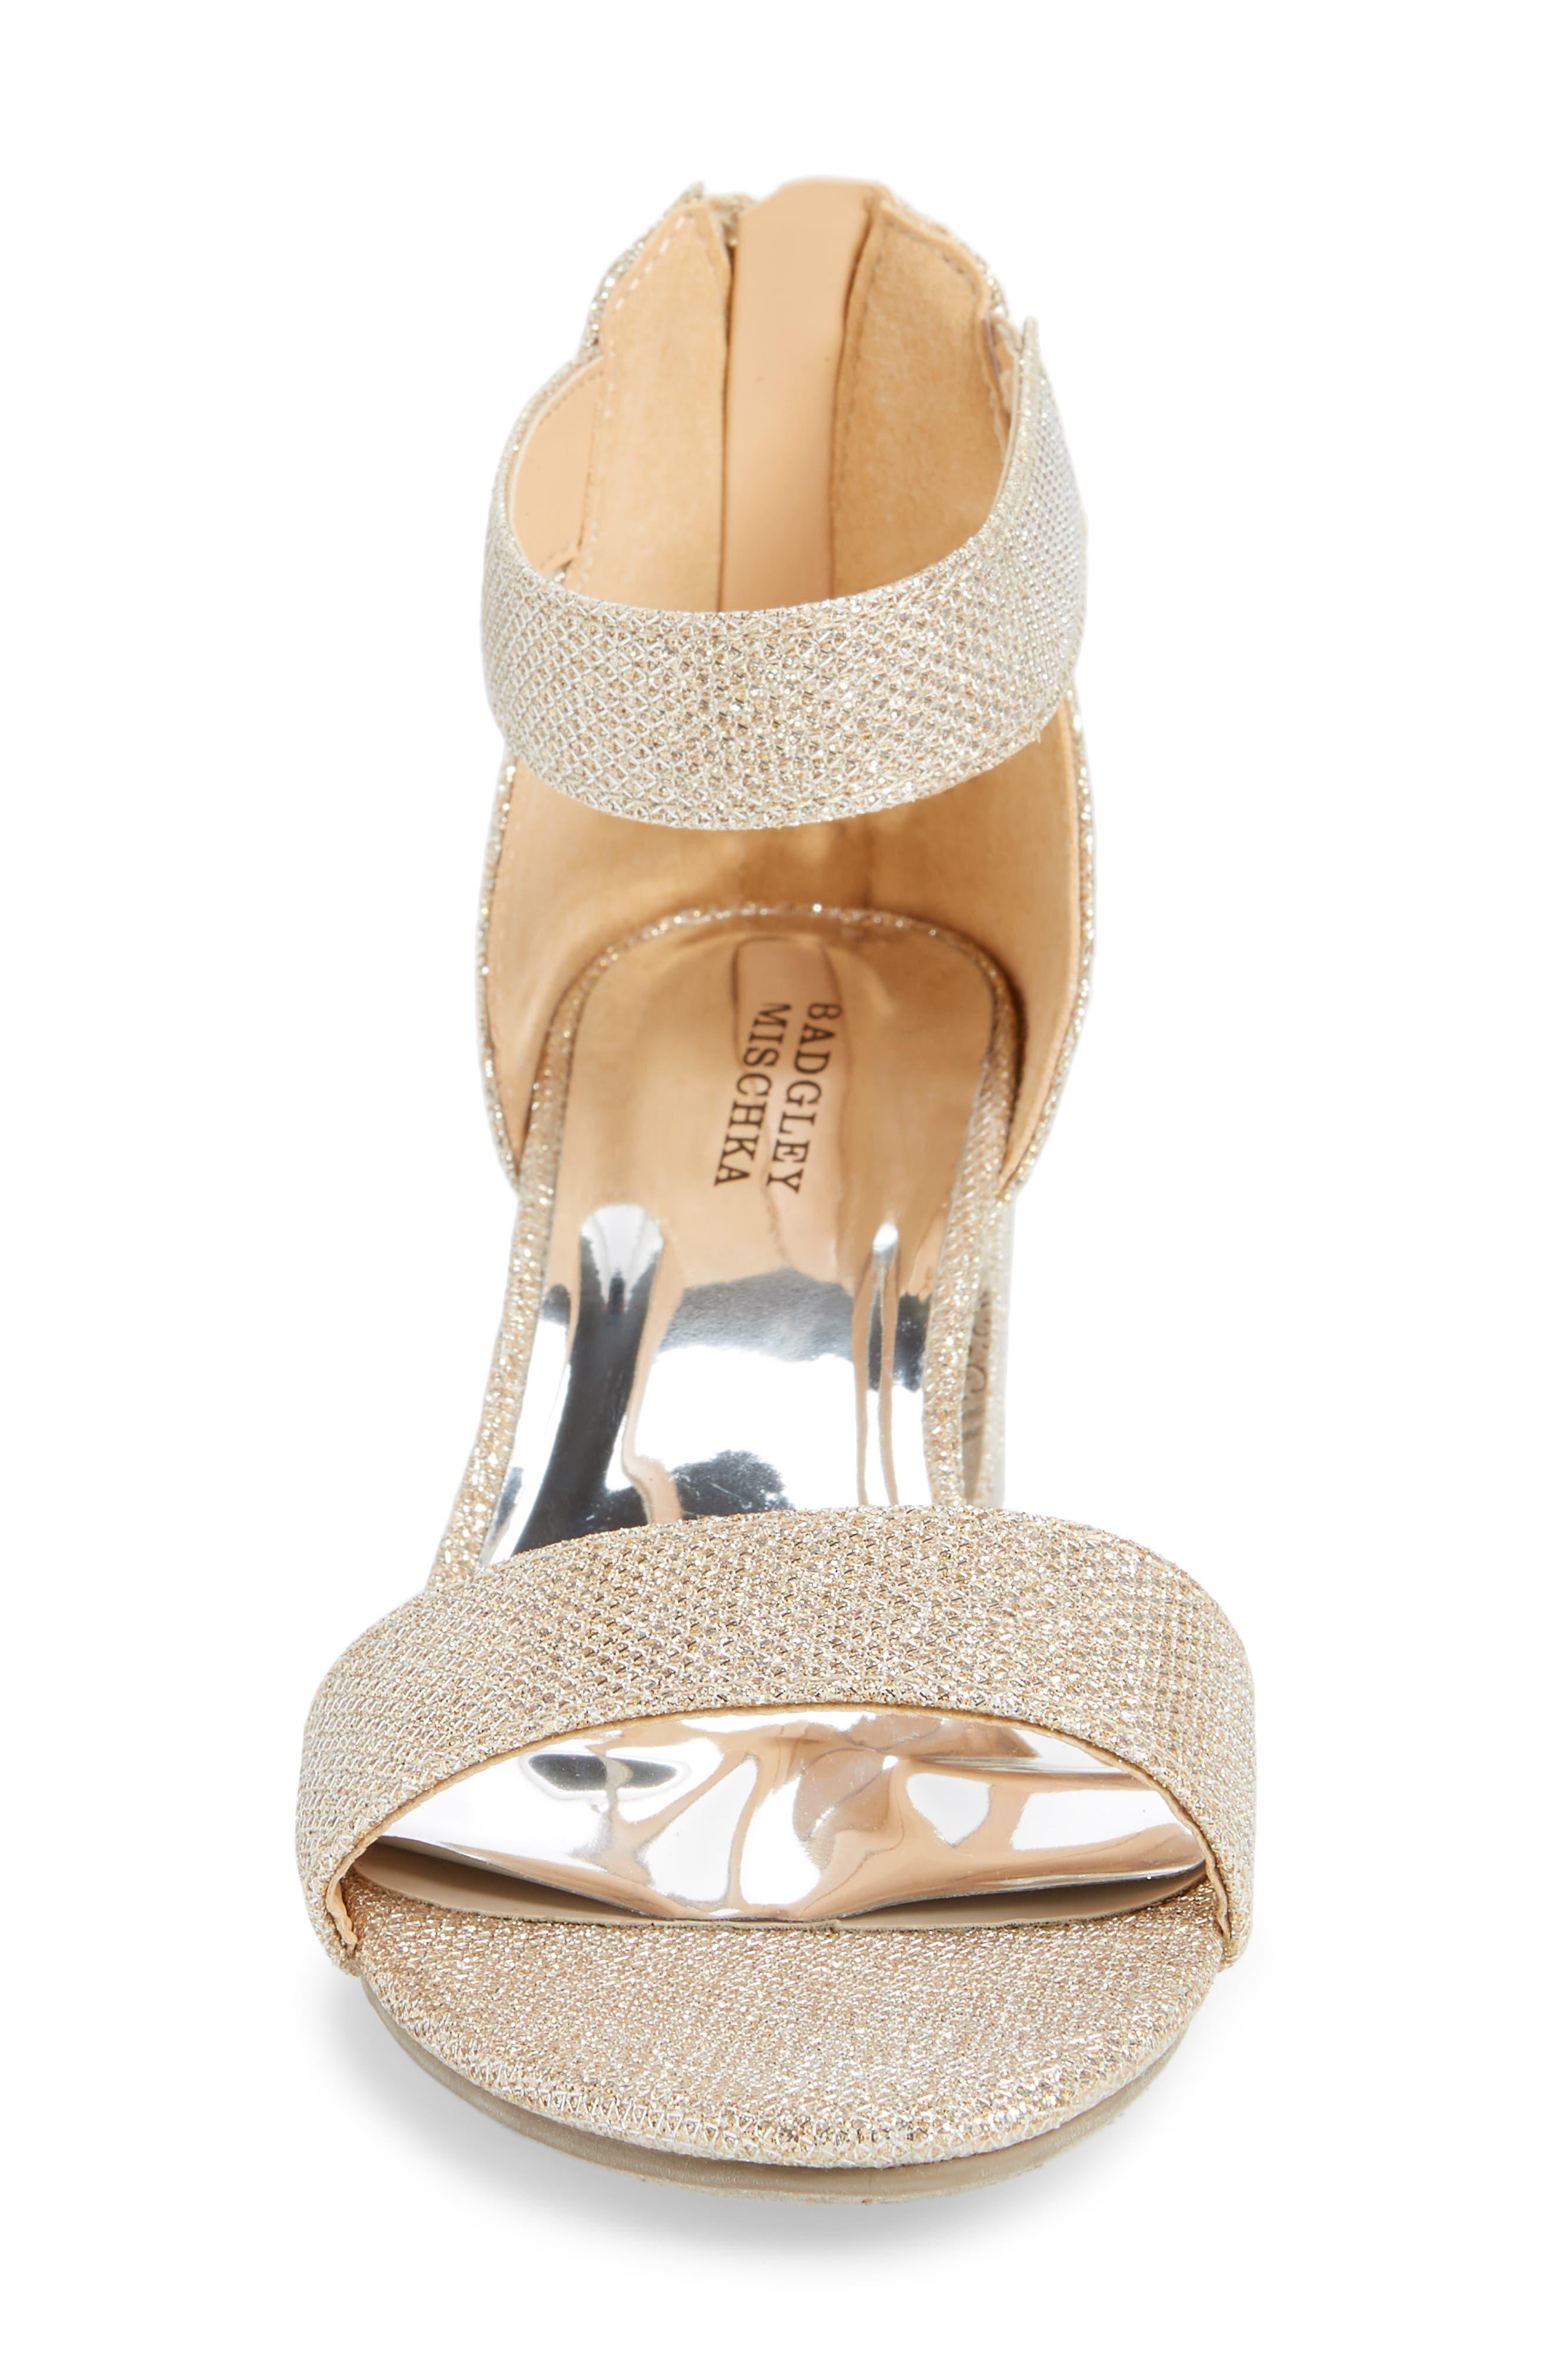 BADGLEY MISCHKA COLLECTION, Badgley Mischka Pernia Velma Shimmer Sandal, Alternate thumbnail 4, color, LIGHT GOLD SHIMMER